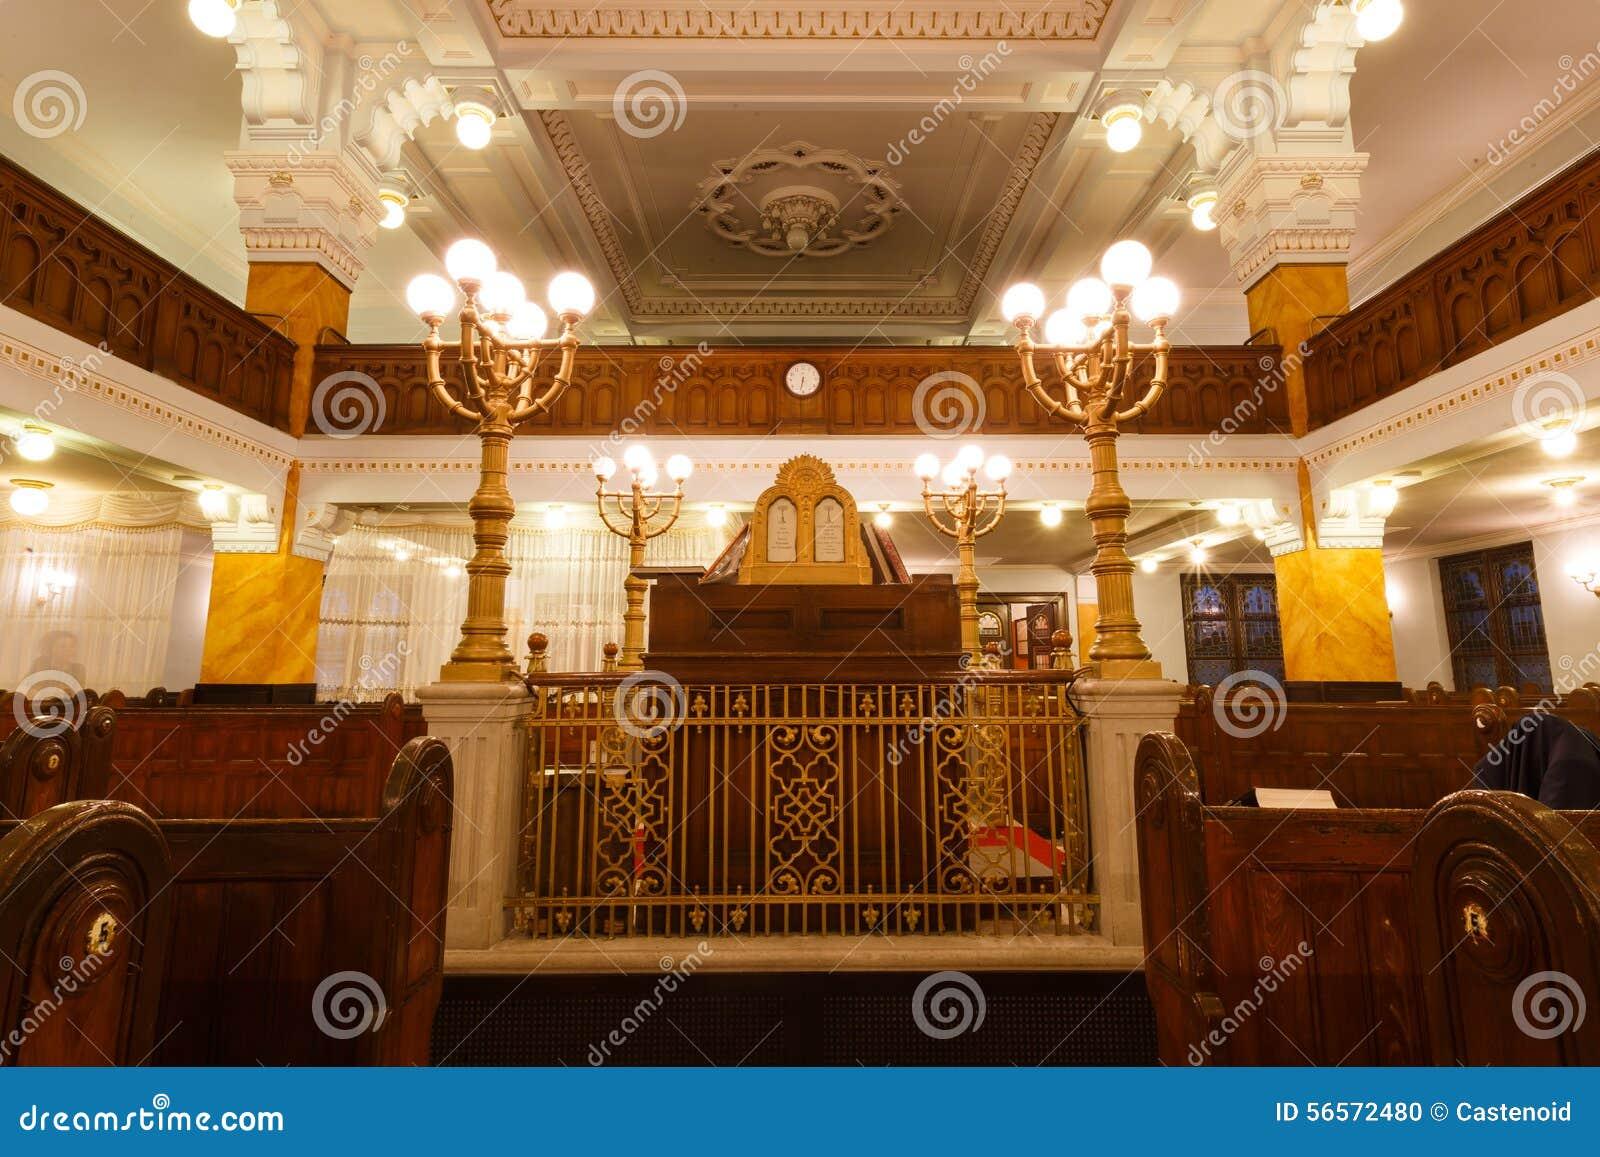 Download Εσωτερικό της συναγωγής Teri Bethlen, Βουδαπέστη Στοκ Εικόνες - εικόνα από χρυσός, παράσιτο: 56572480